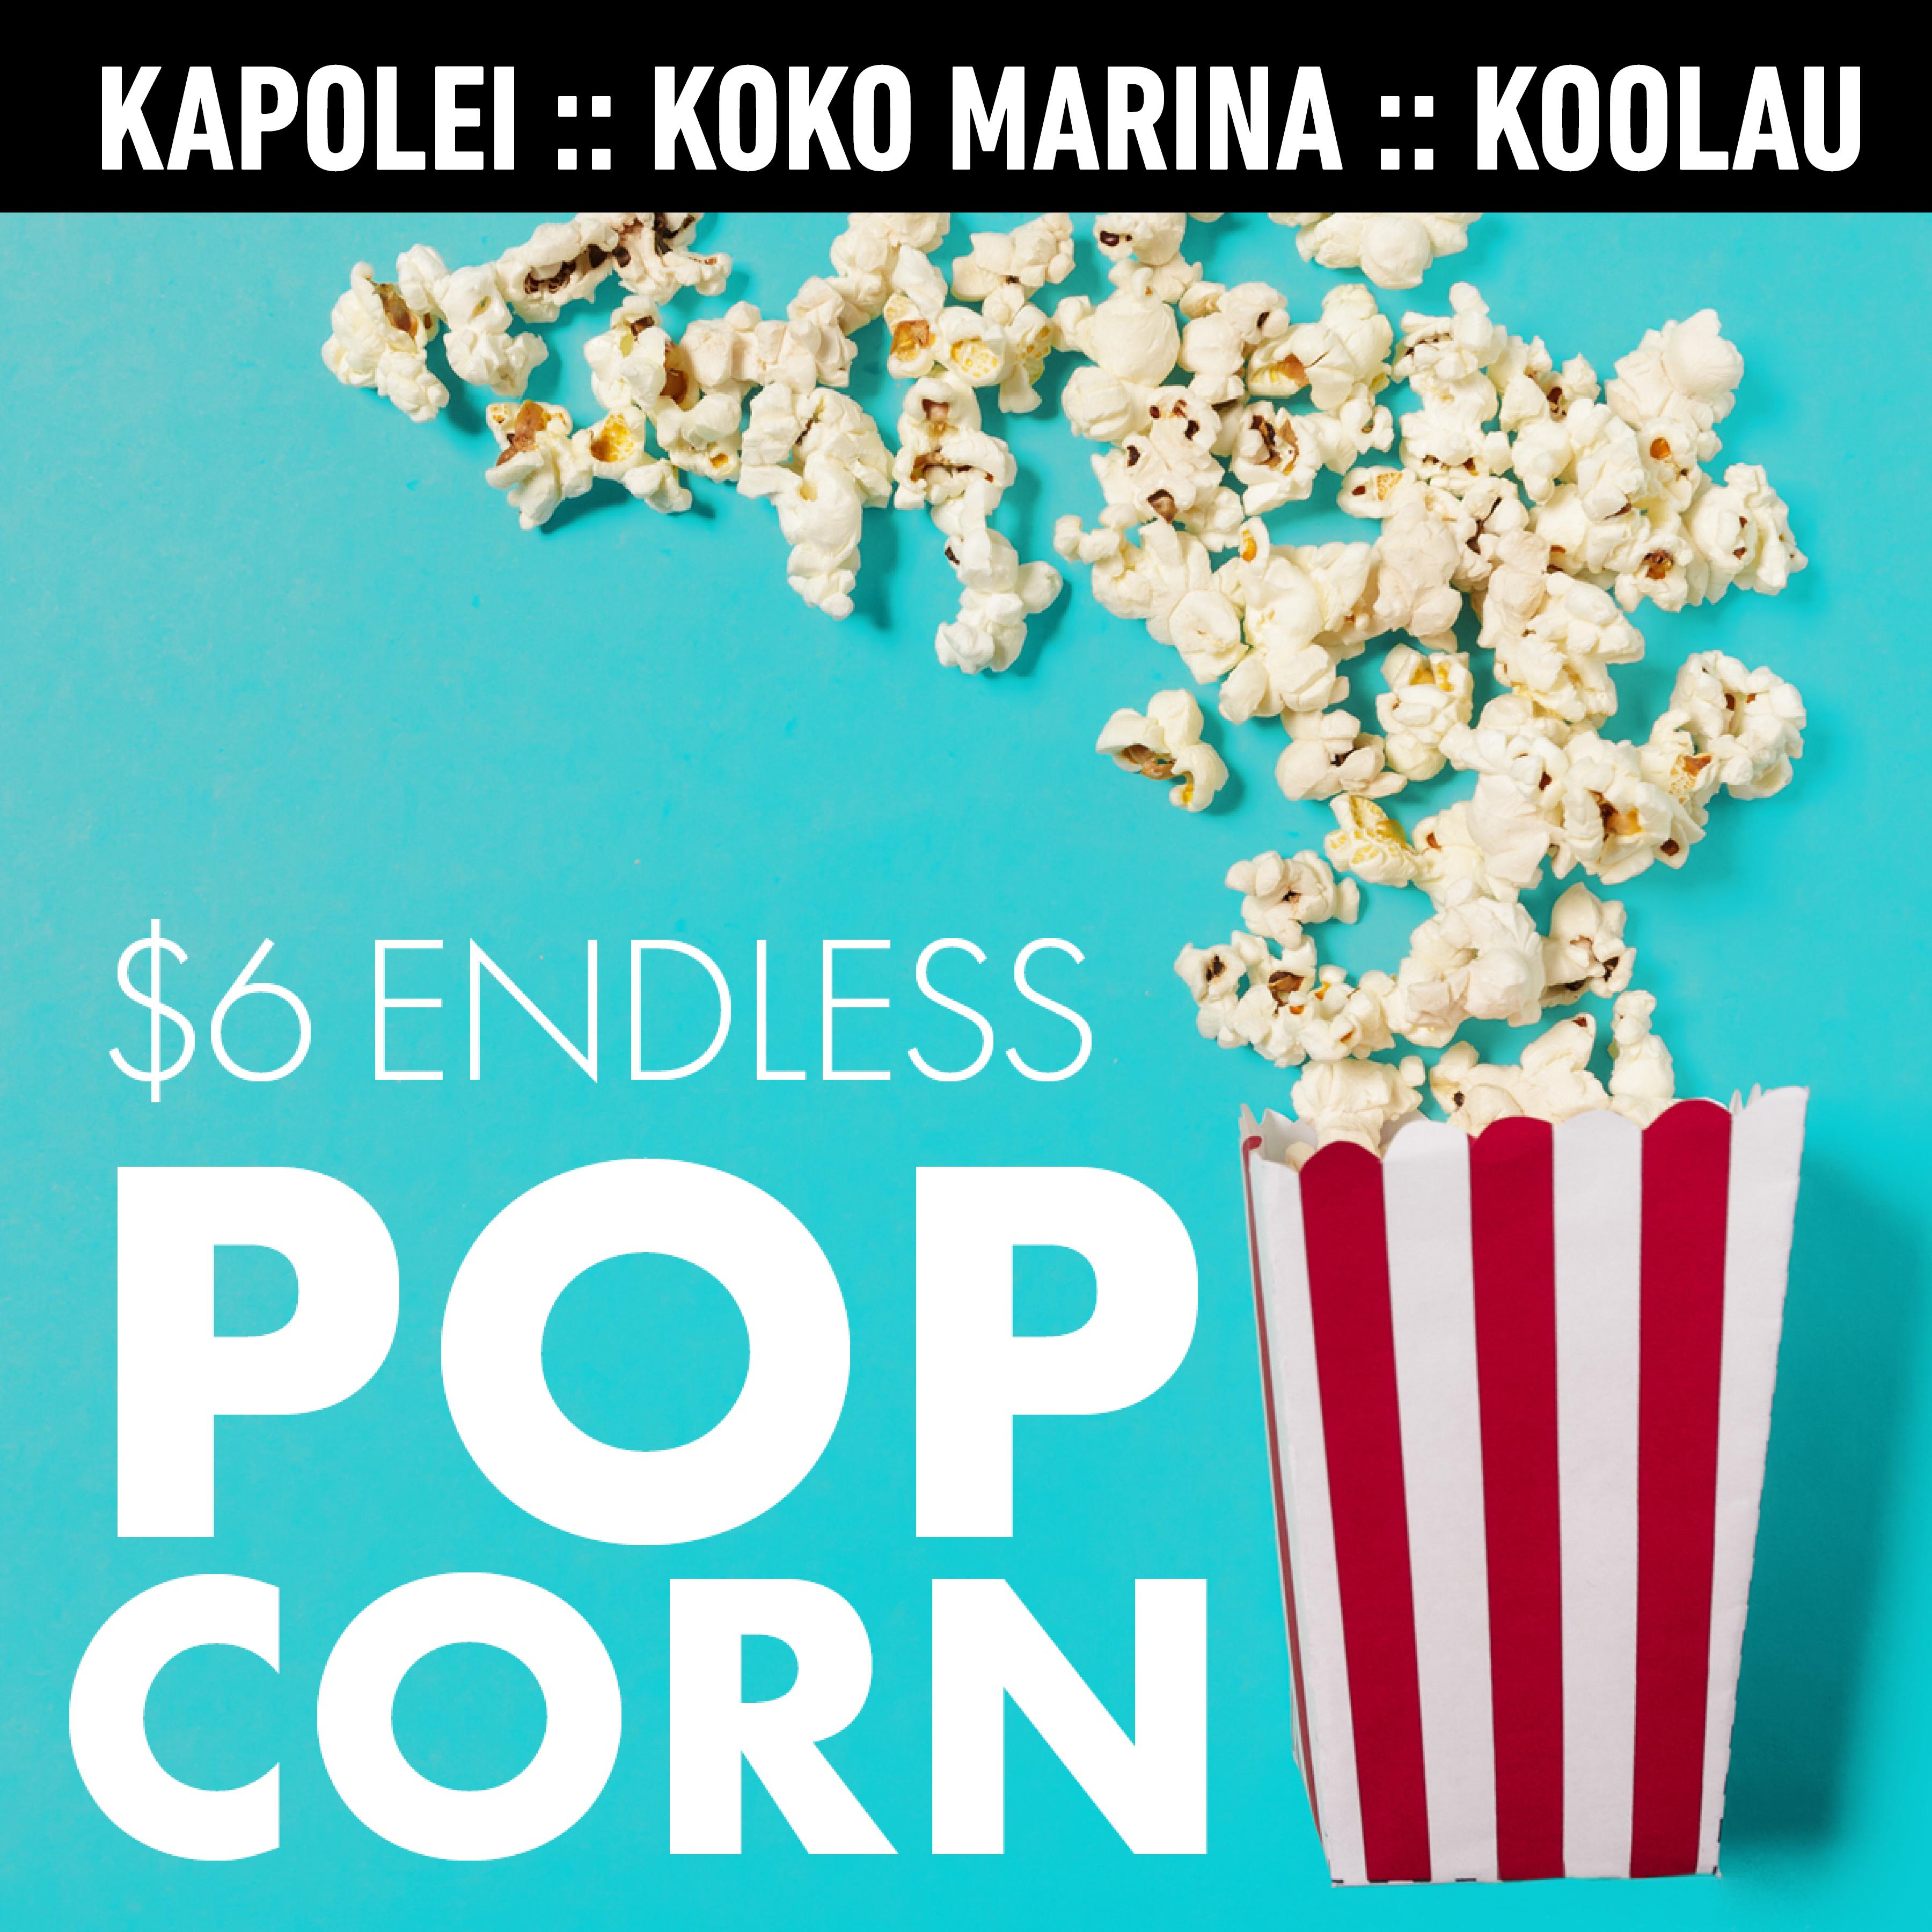 $6 Endless Popcorn